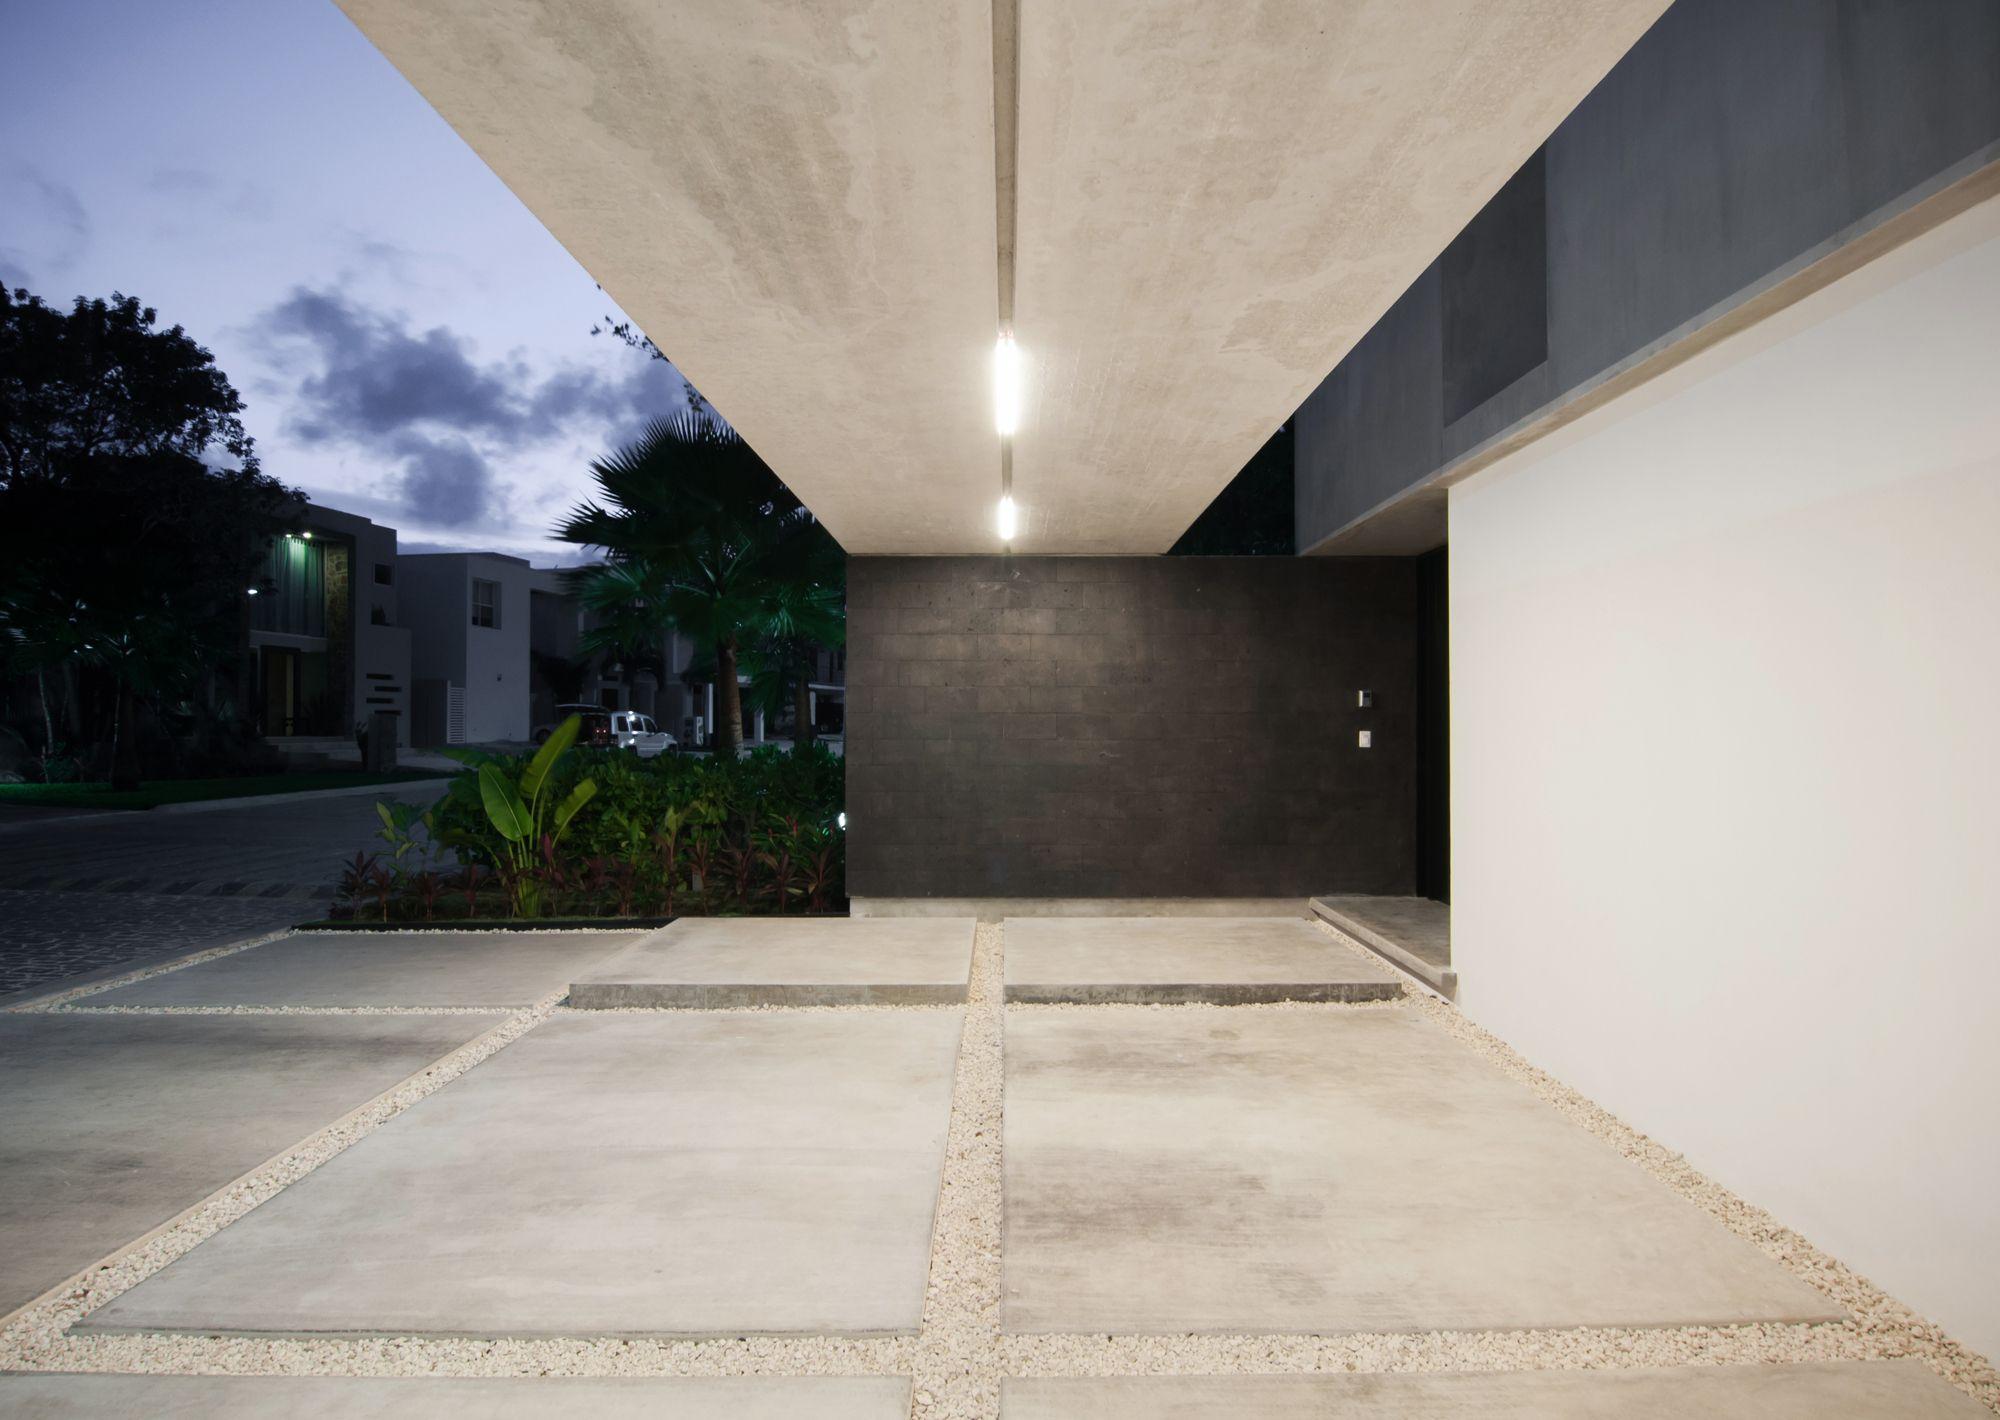 Garcias House / Warm Architects